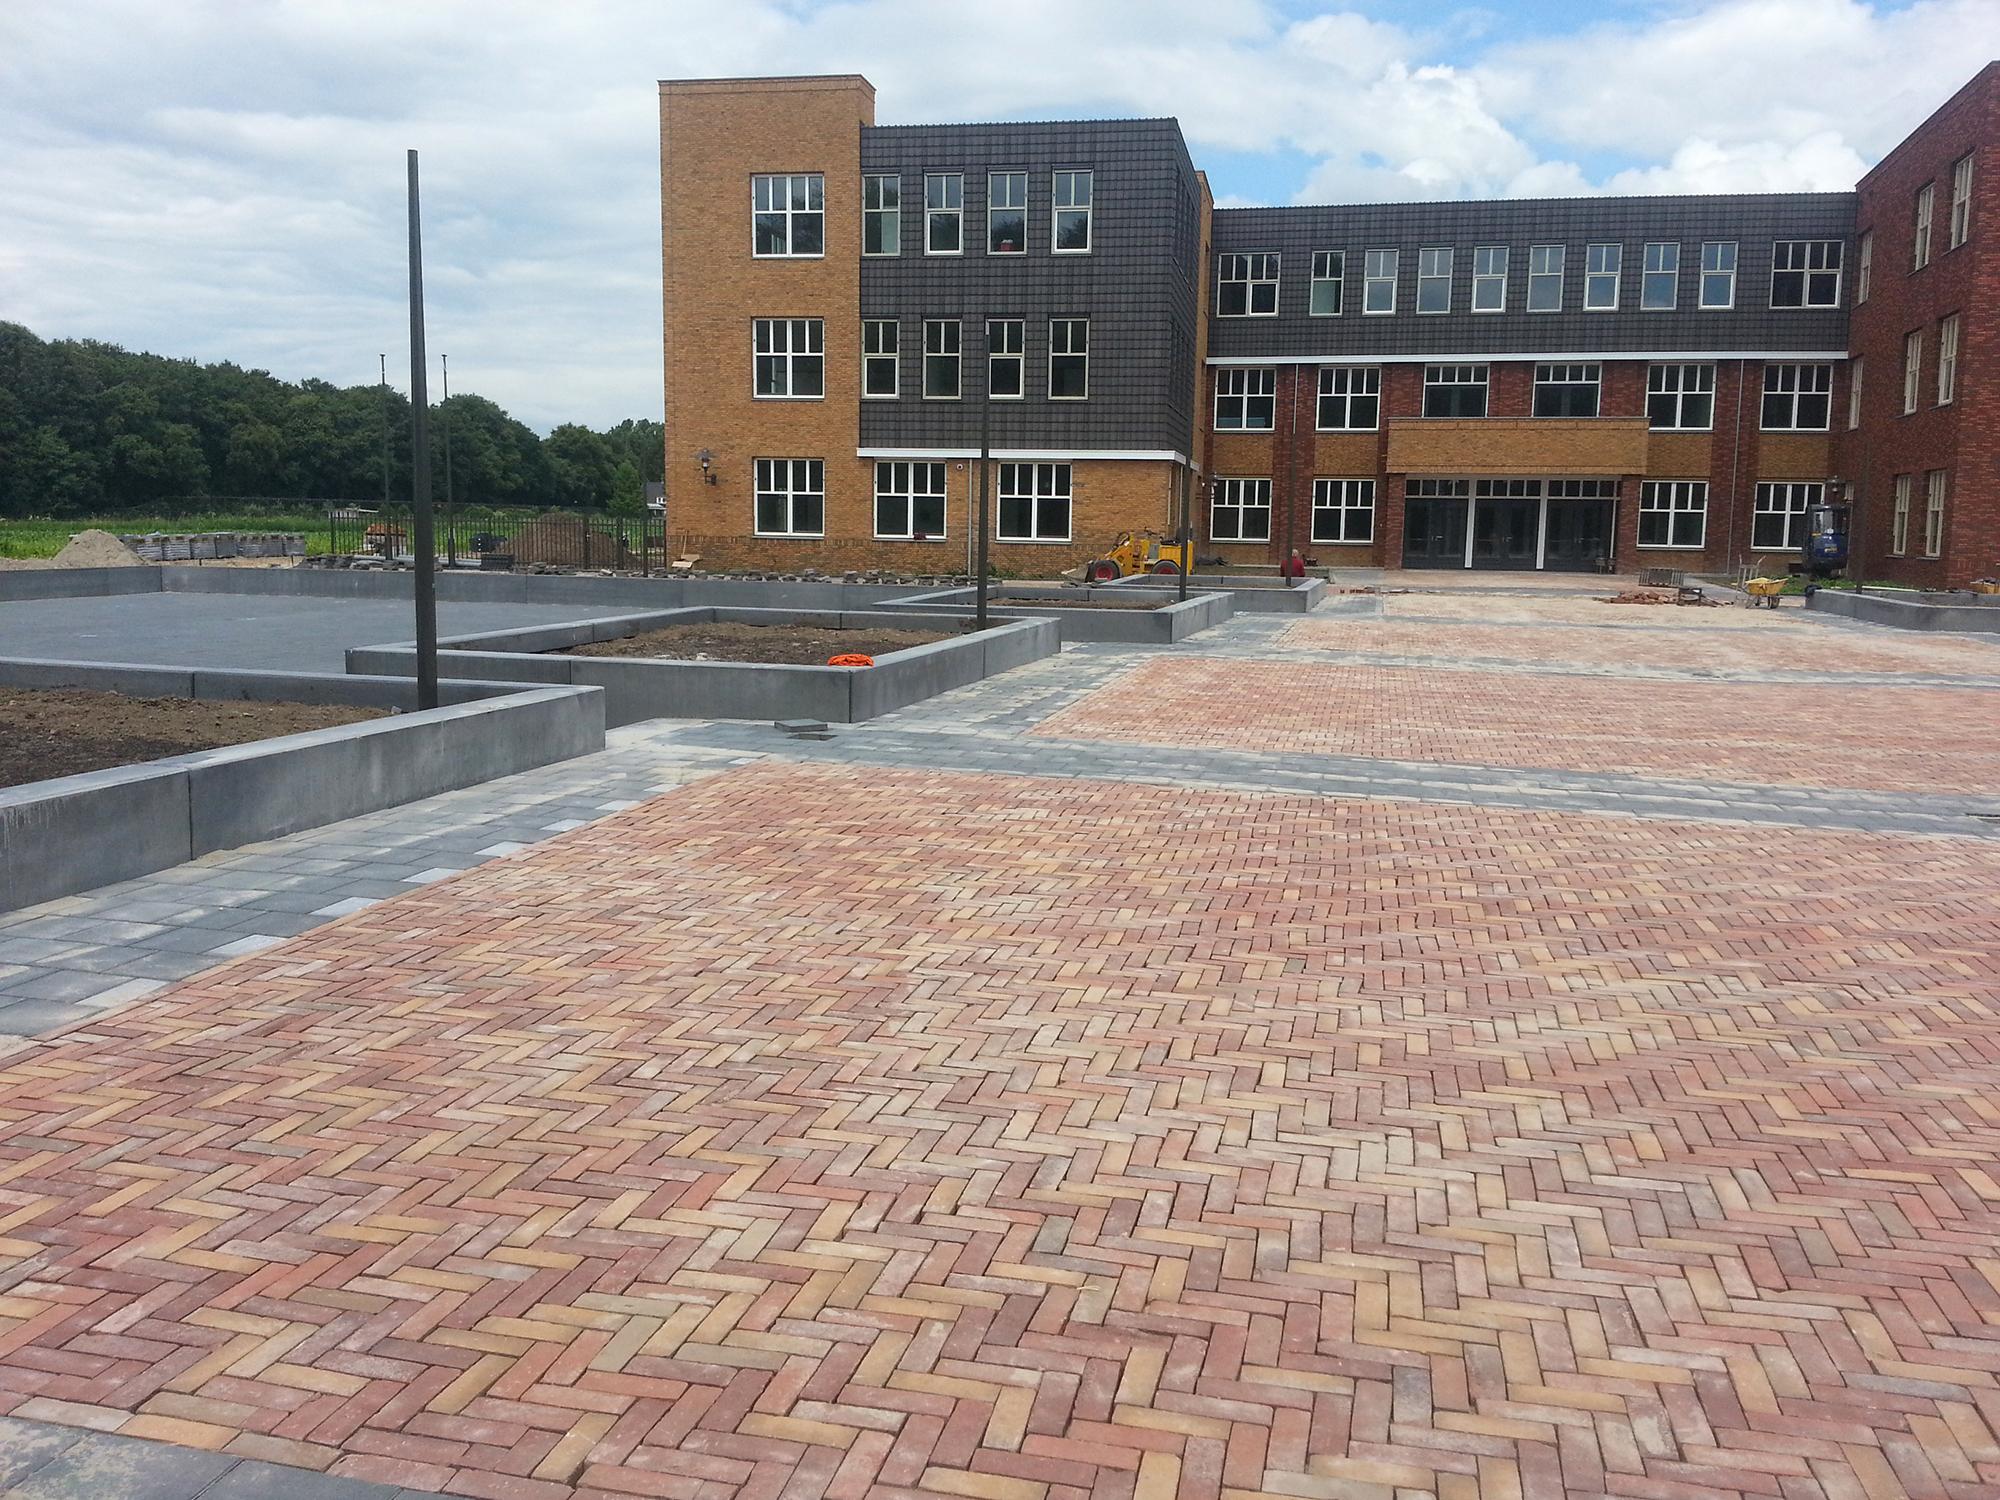 Carolus Borromeus College Brandevoort, Helmond